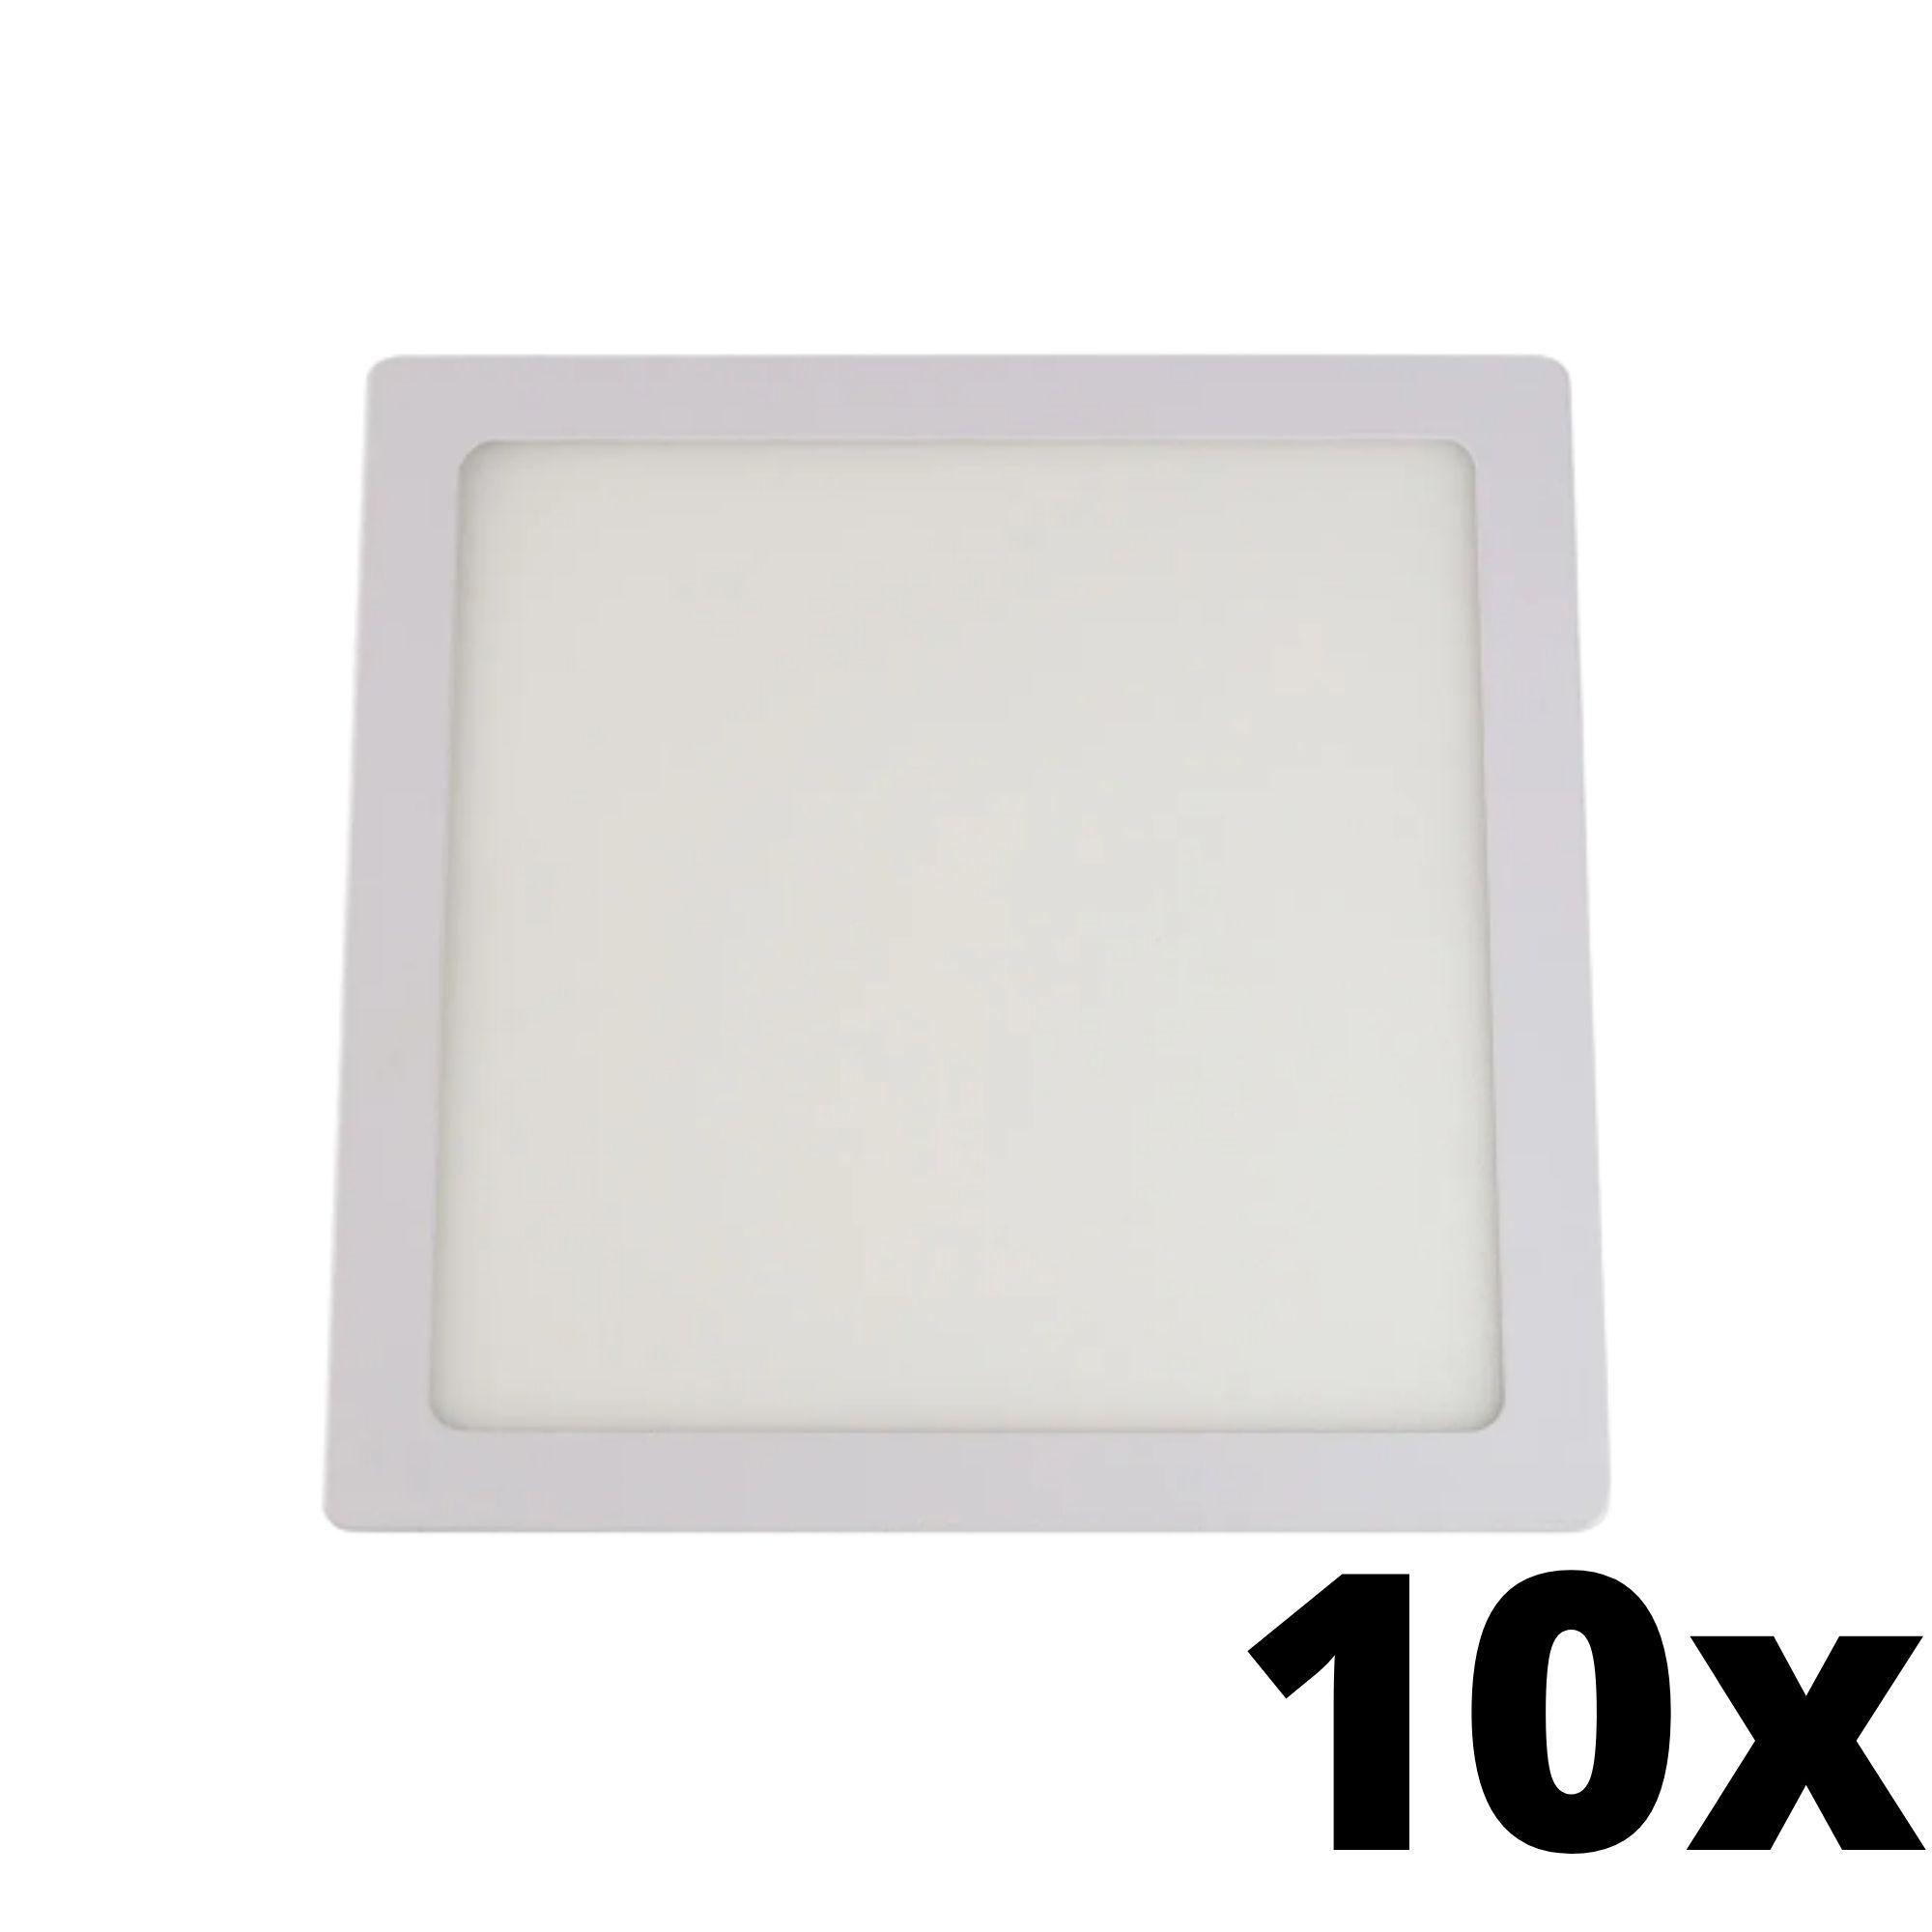 Kit 10 und Painel de Led Embutir 18w Quadrado 6500k